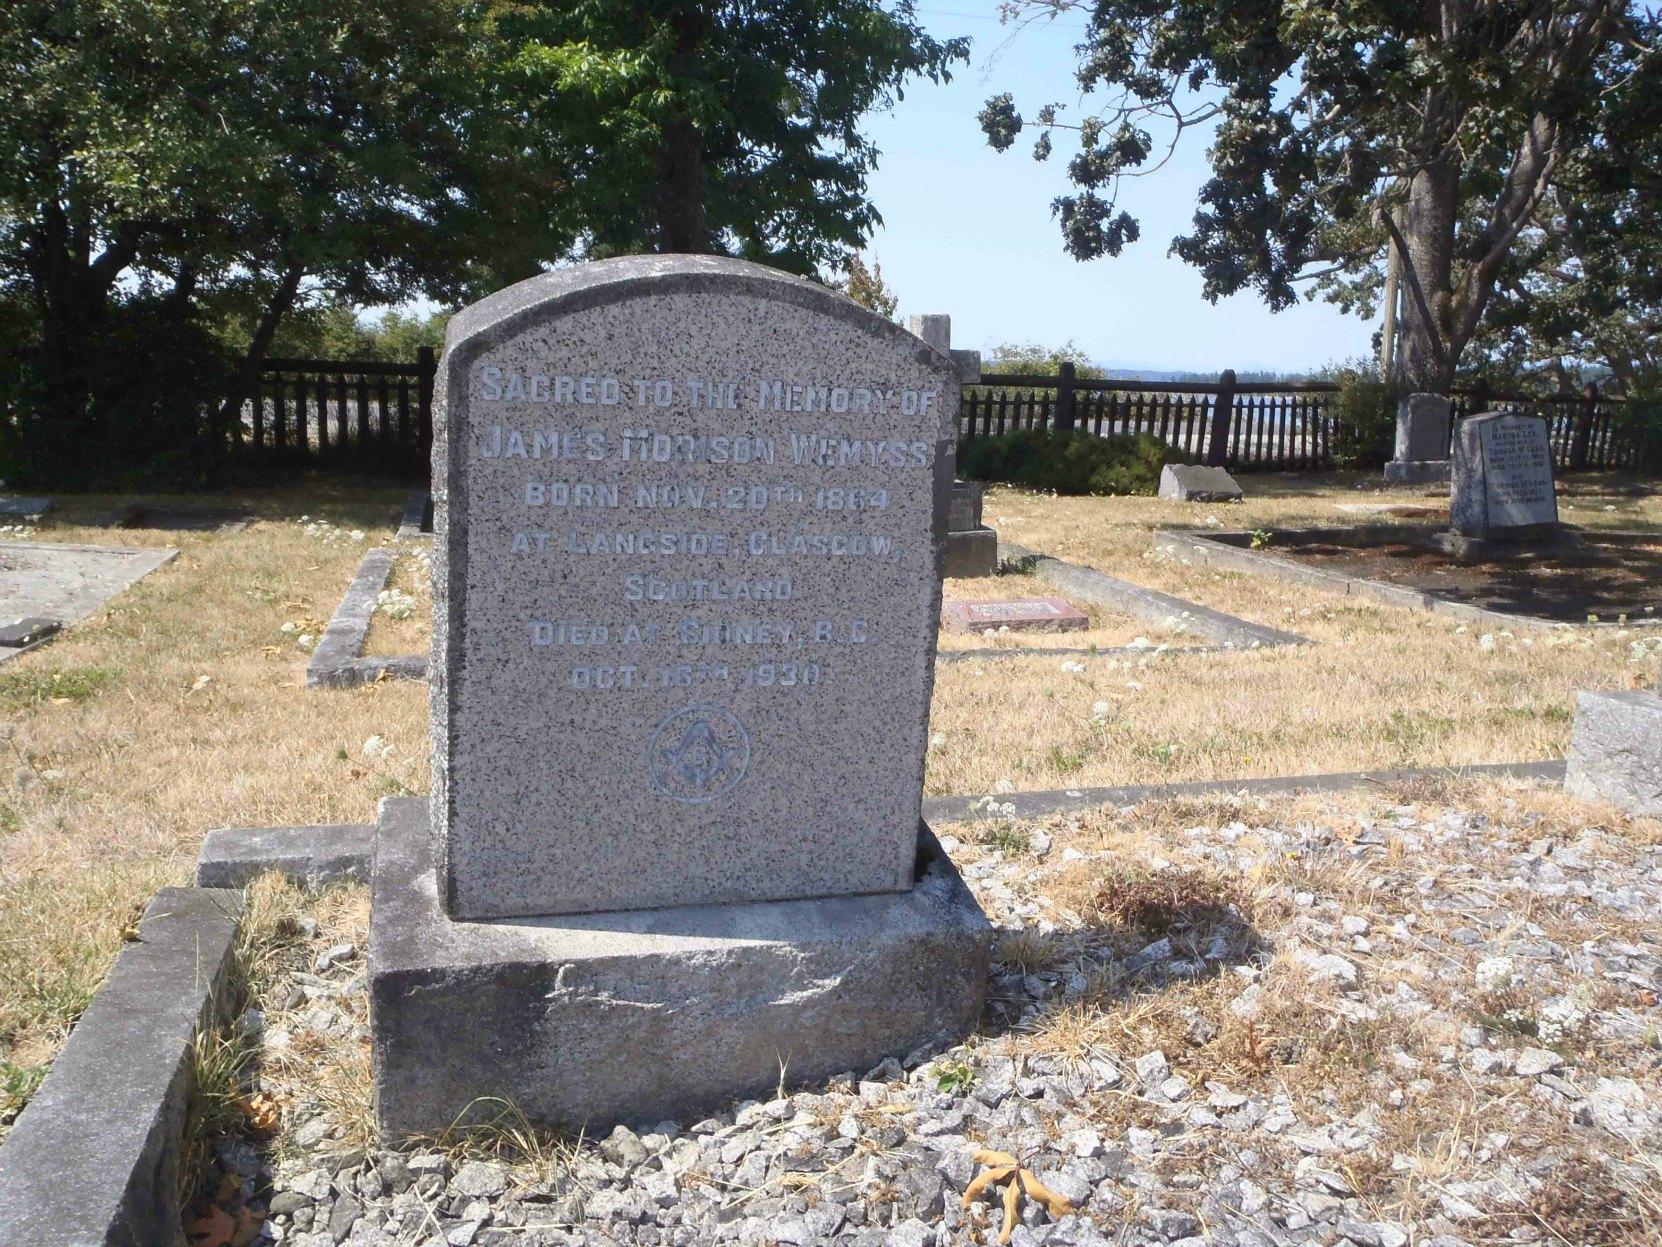 James Morison Wemyss grave, Holy Trinity Anglican Church cemetery, Sidney, B.C.